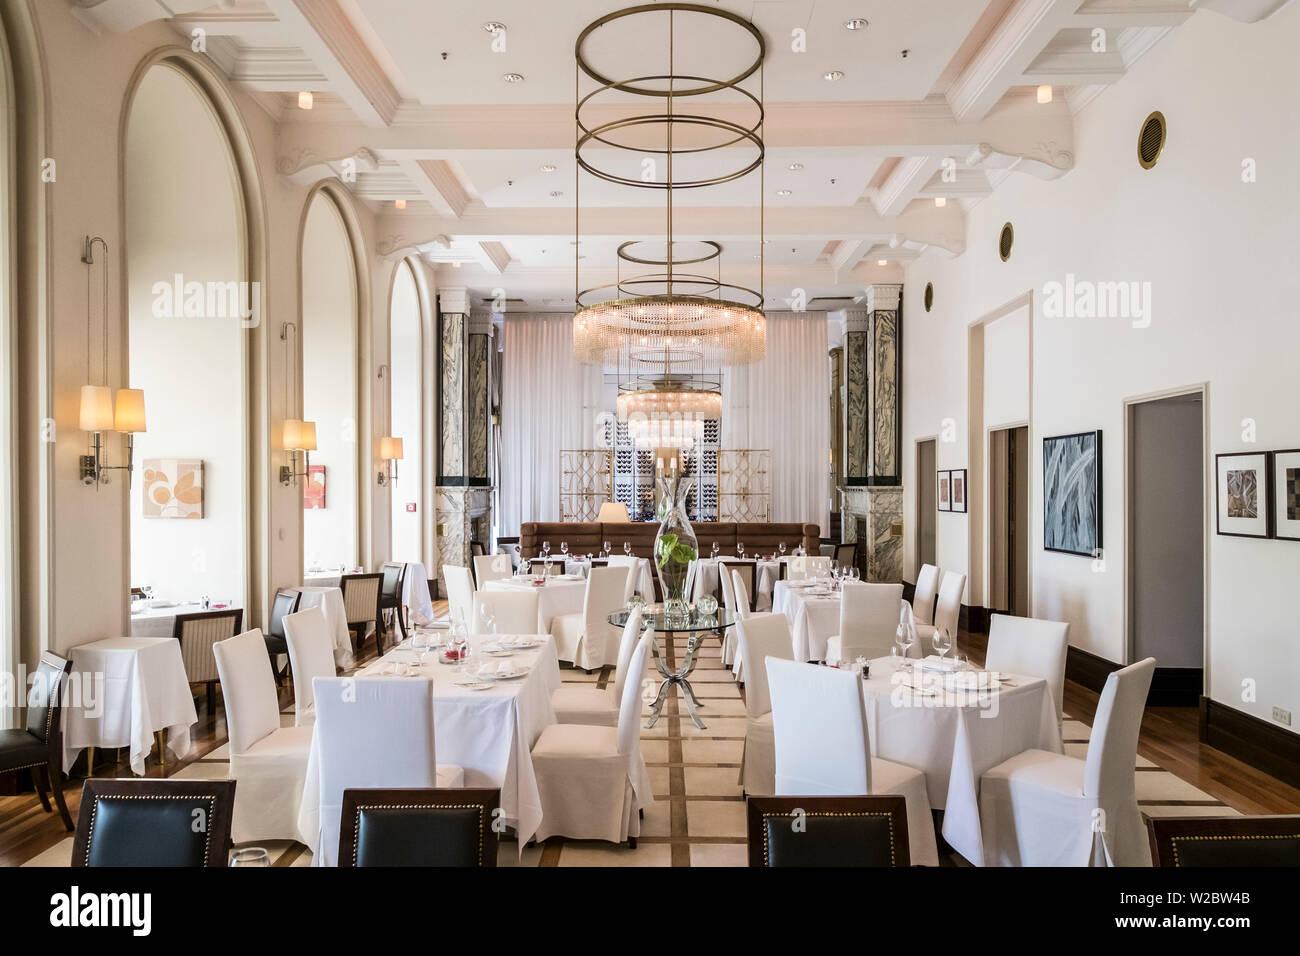 Zinfandel Restaurant Hotel Esplanade Zagreb Croatia Stock Photo Alamy